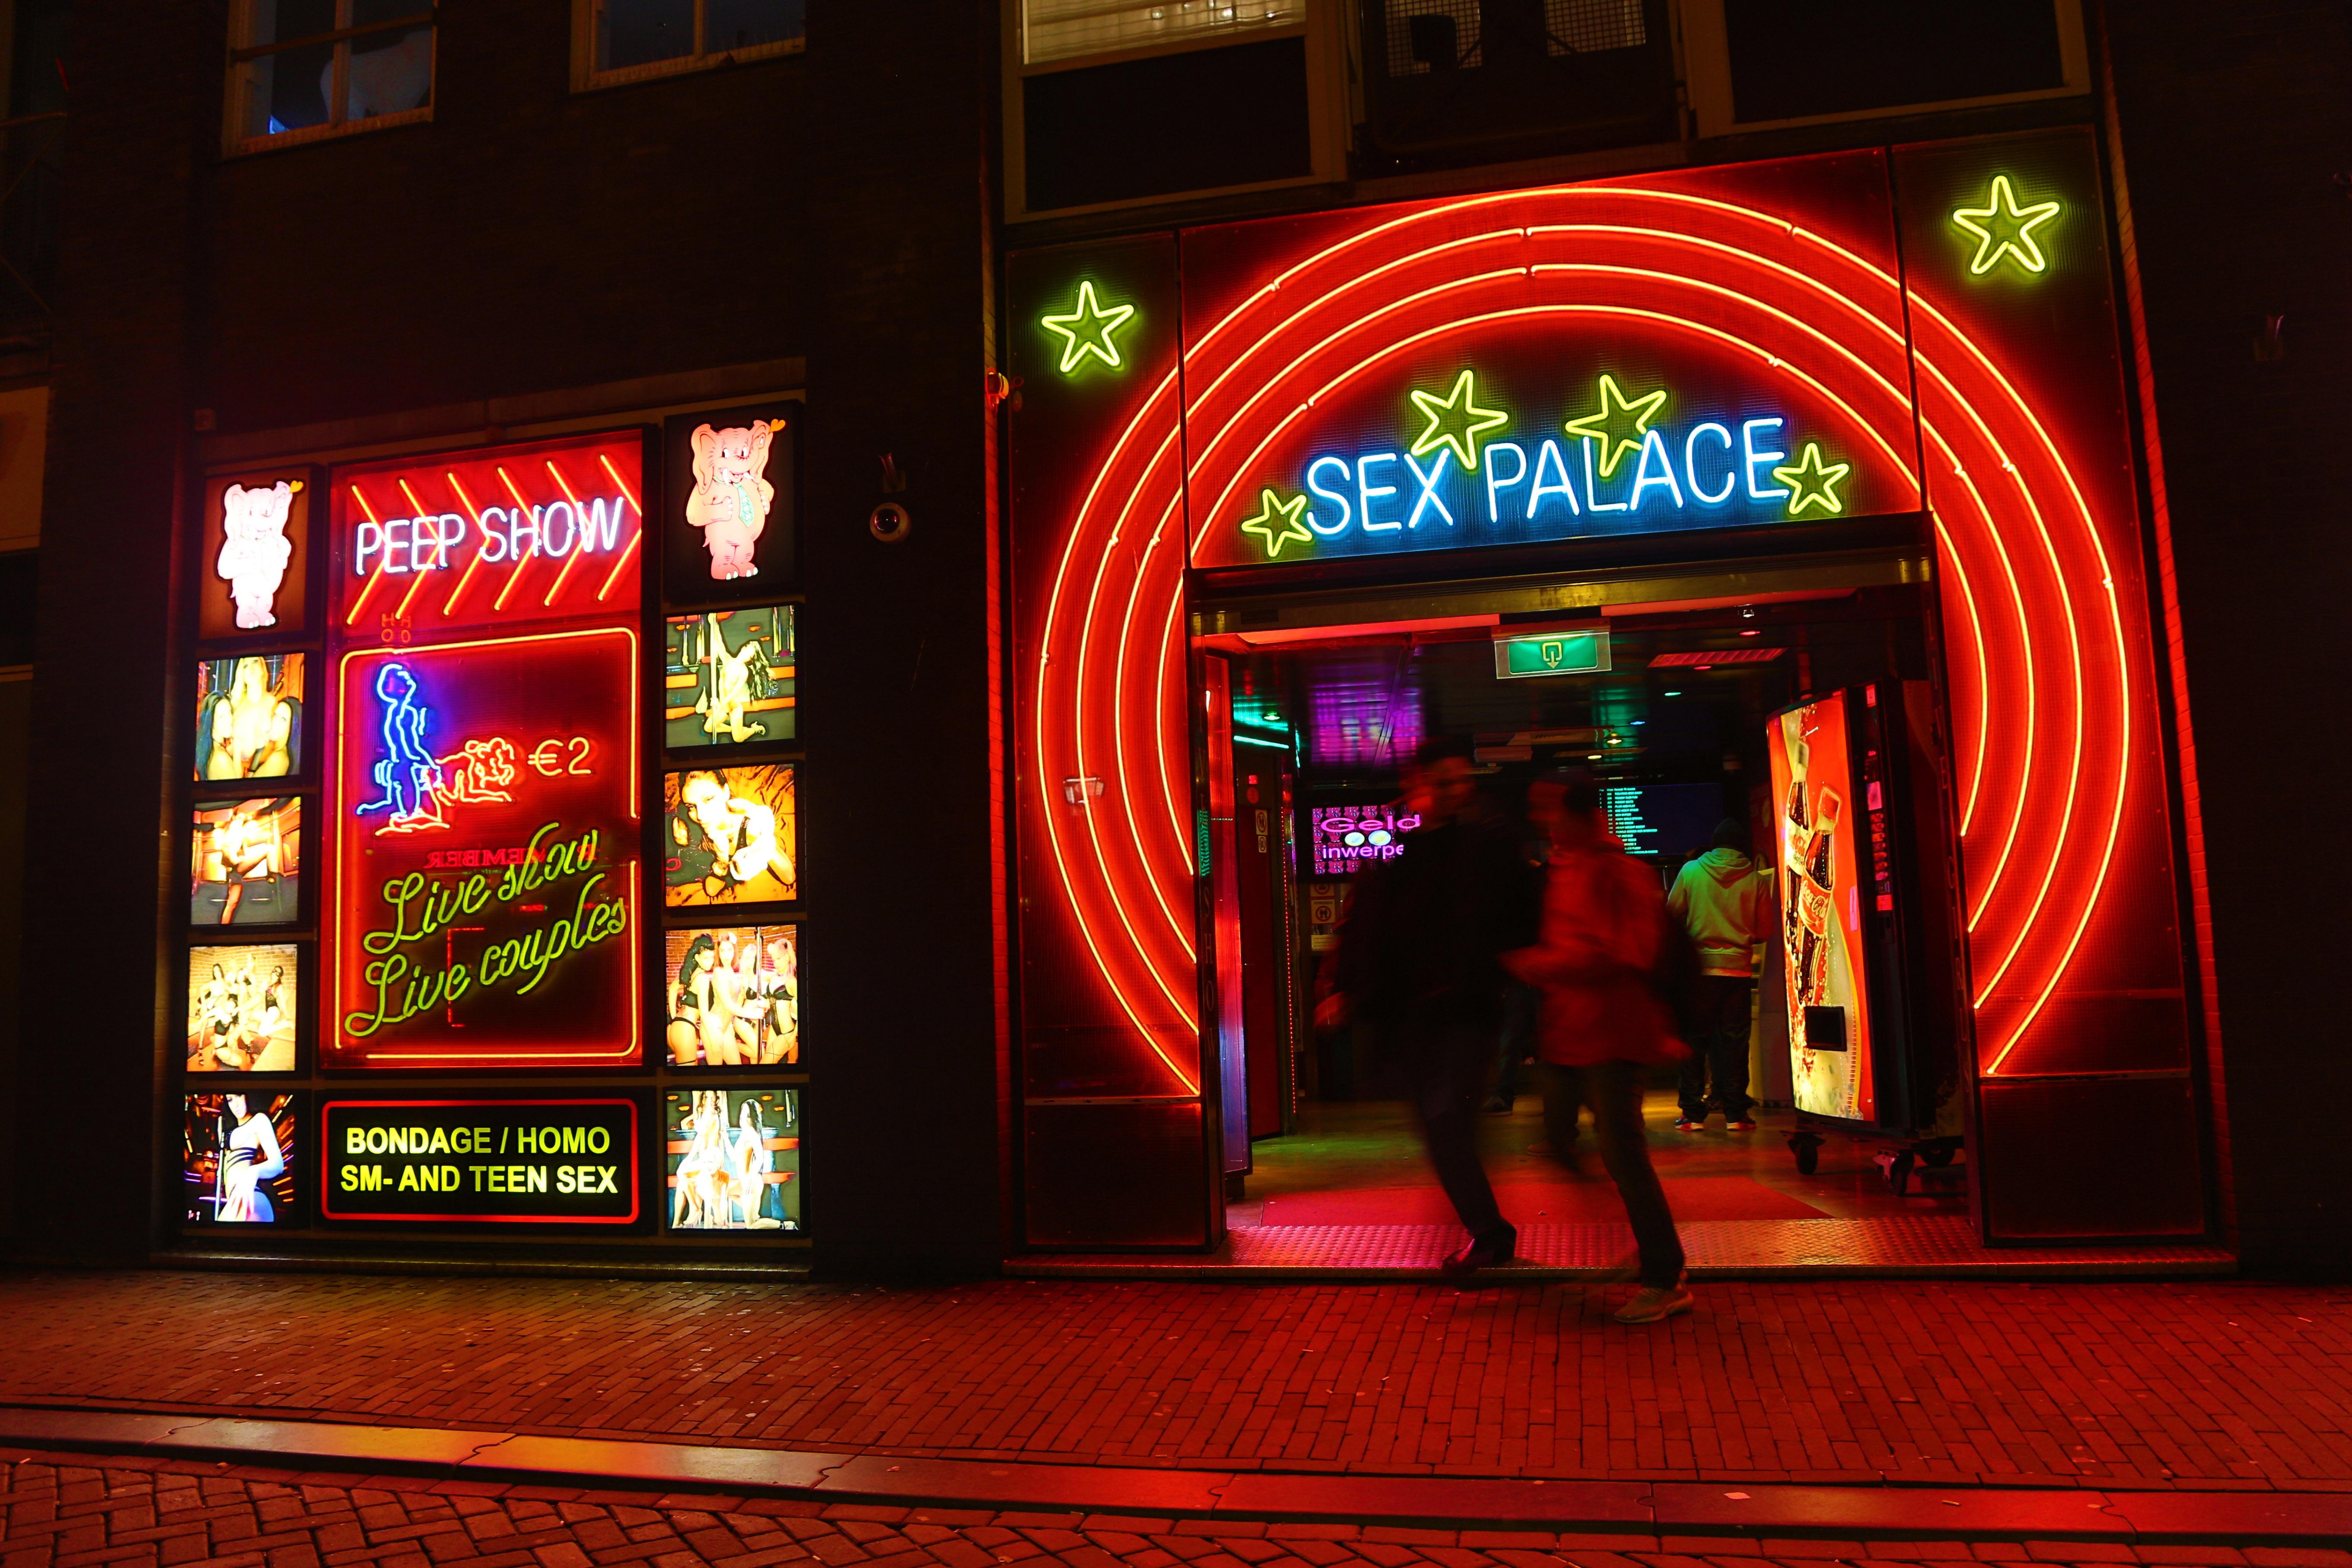 Amsterdam, Netherlands - Dec 2013